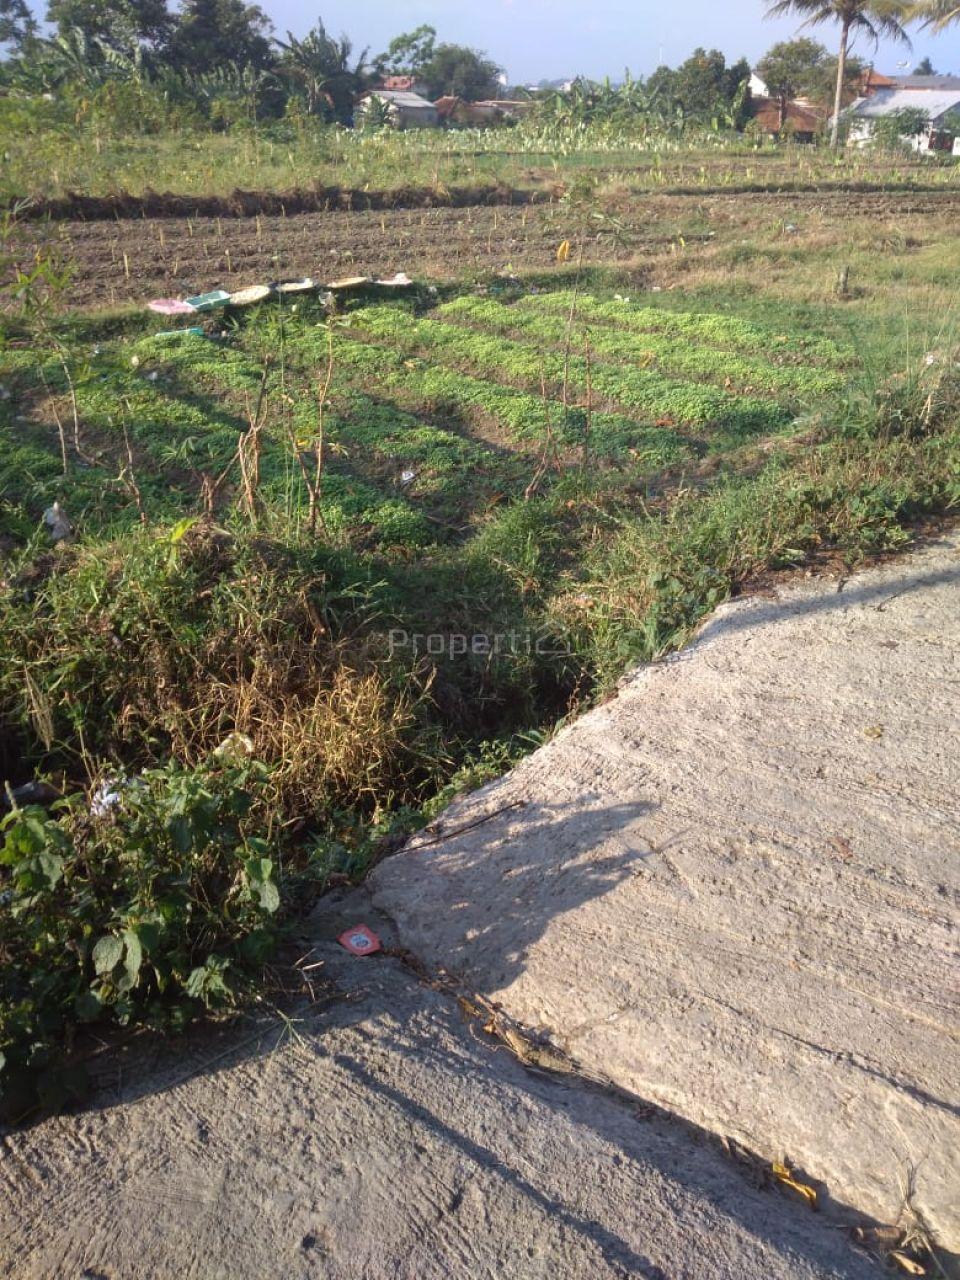 Land 40 Ha for Housing in Cibungbulang, Jawa Barat